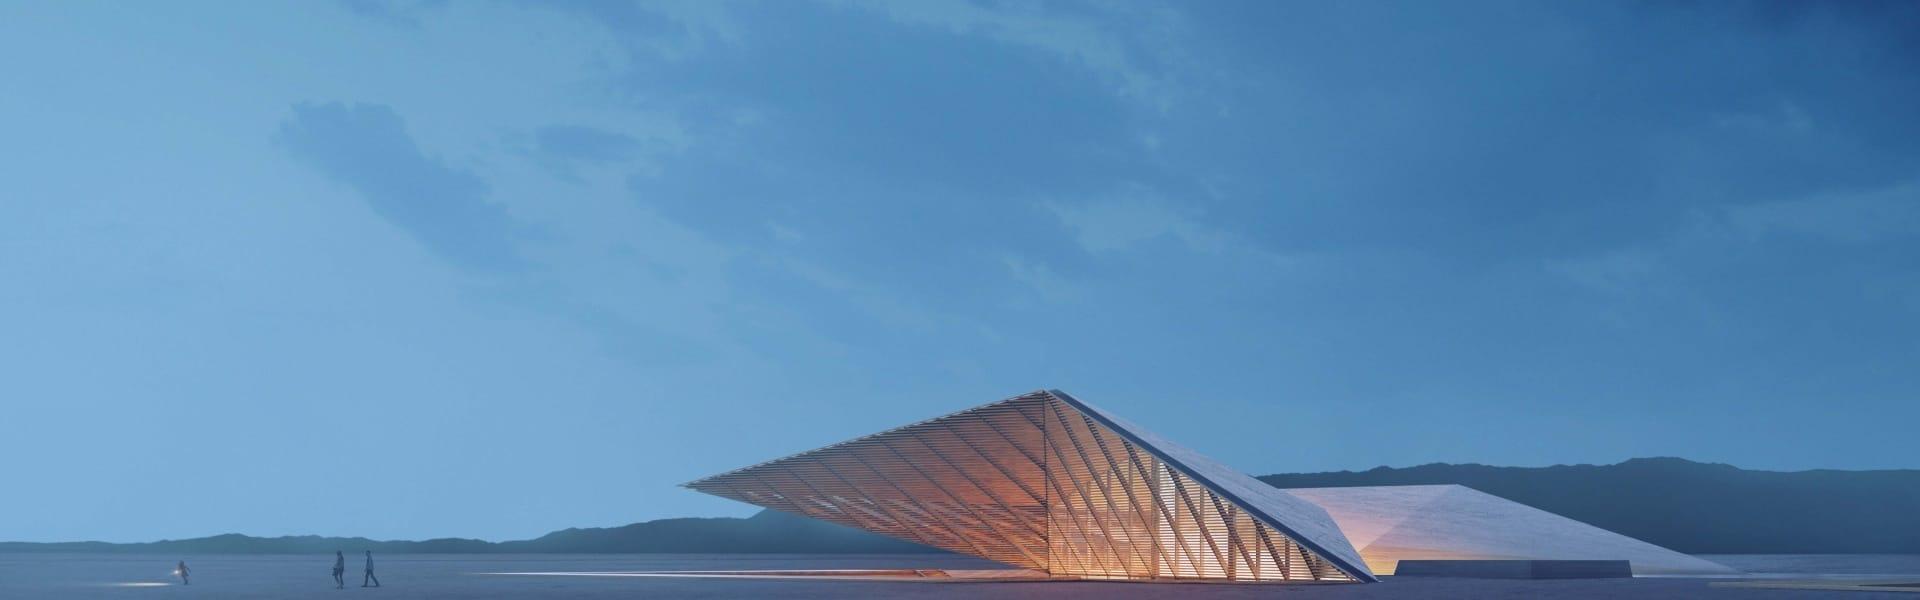 Alex Hogrefe Visualizing Architecture